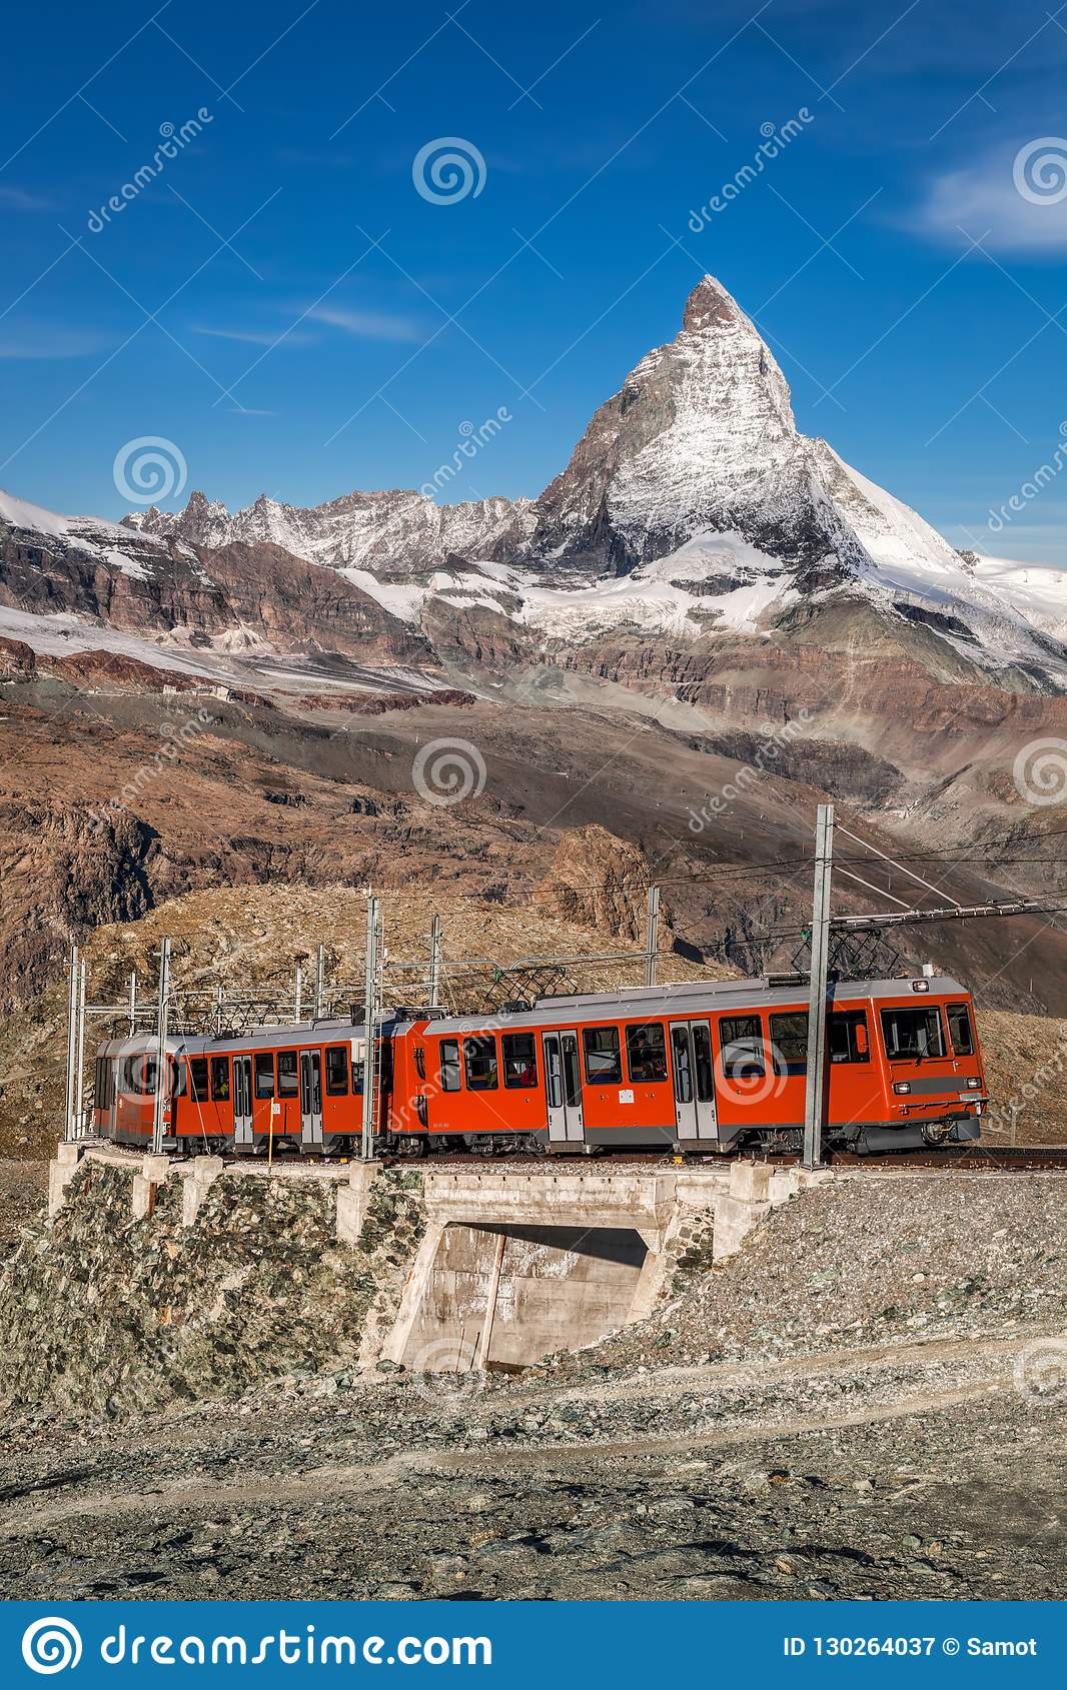 Matterhorn peak with Gornergrat train in Zermatt area, Switzerland